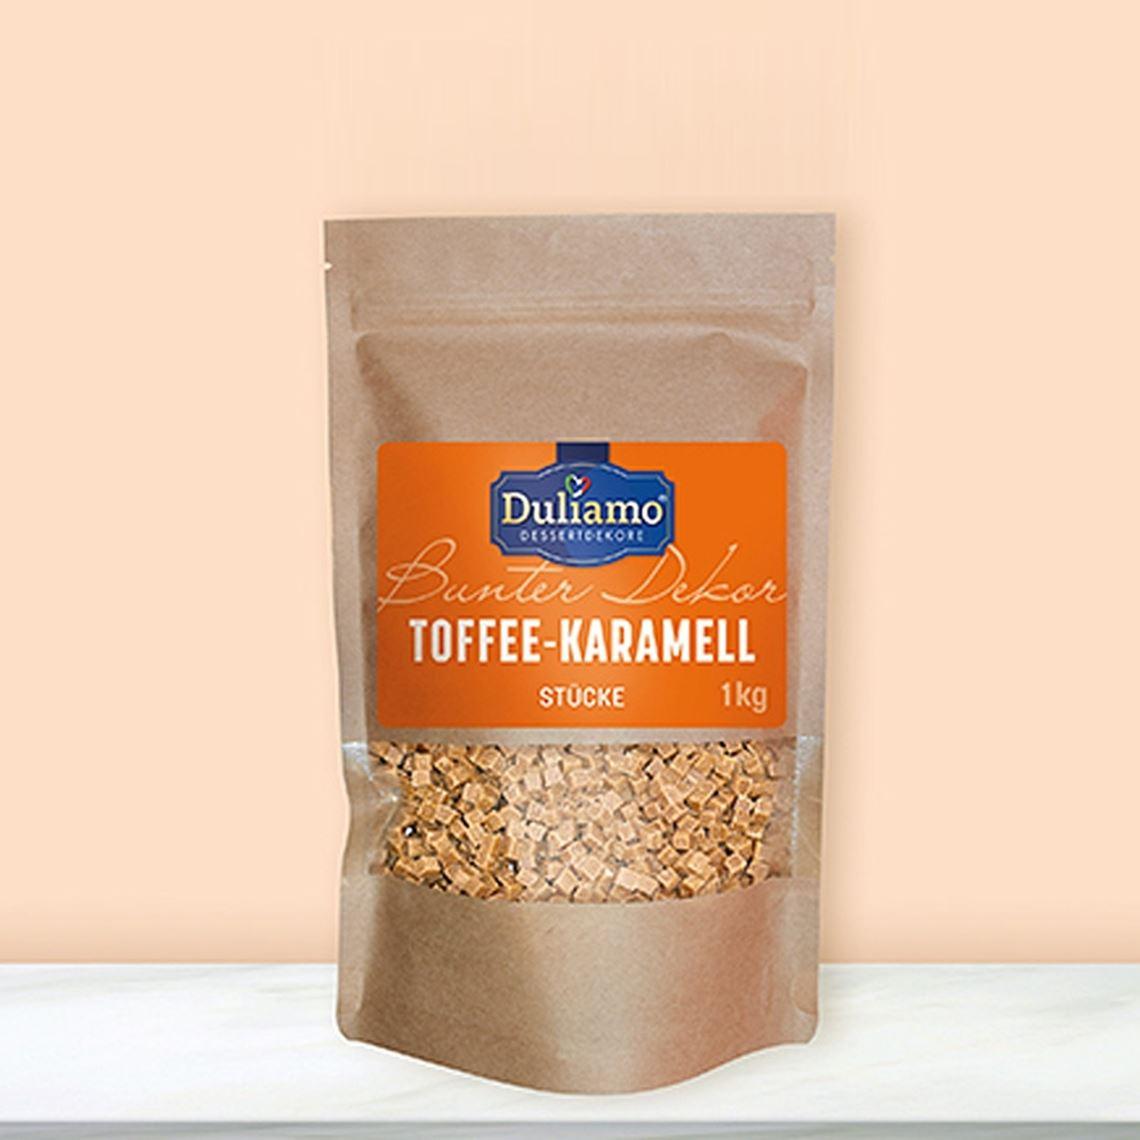 TOFFEE-KARAMELLSTÜCKE      1KG